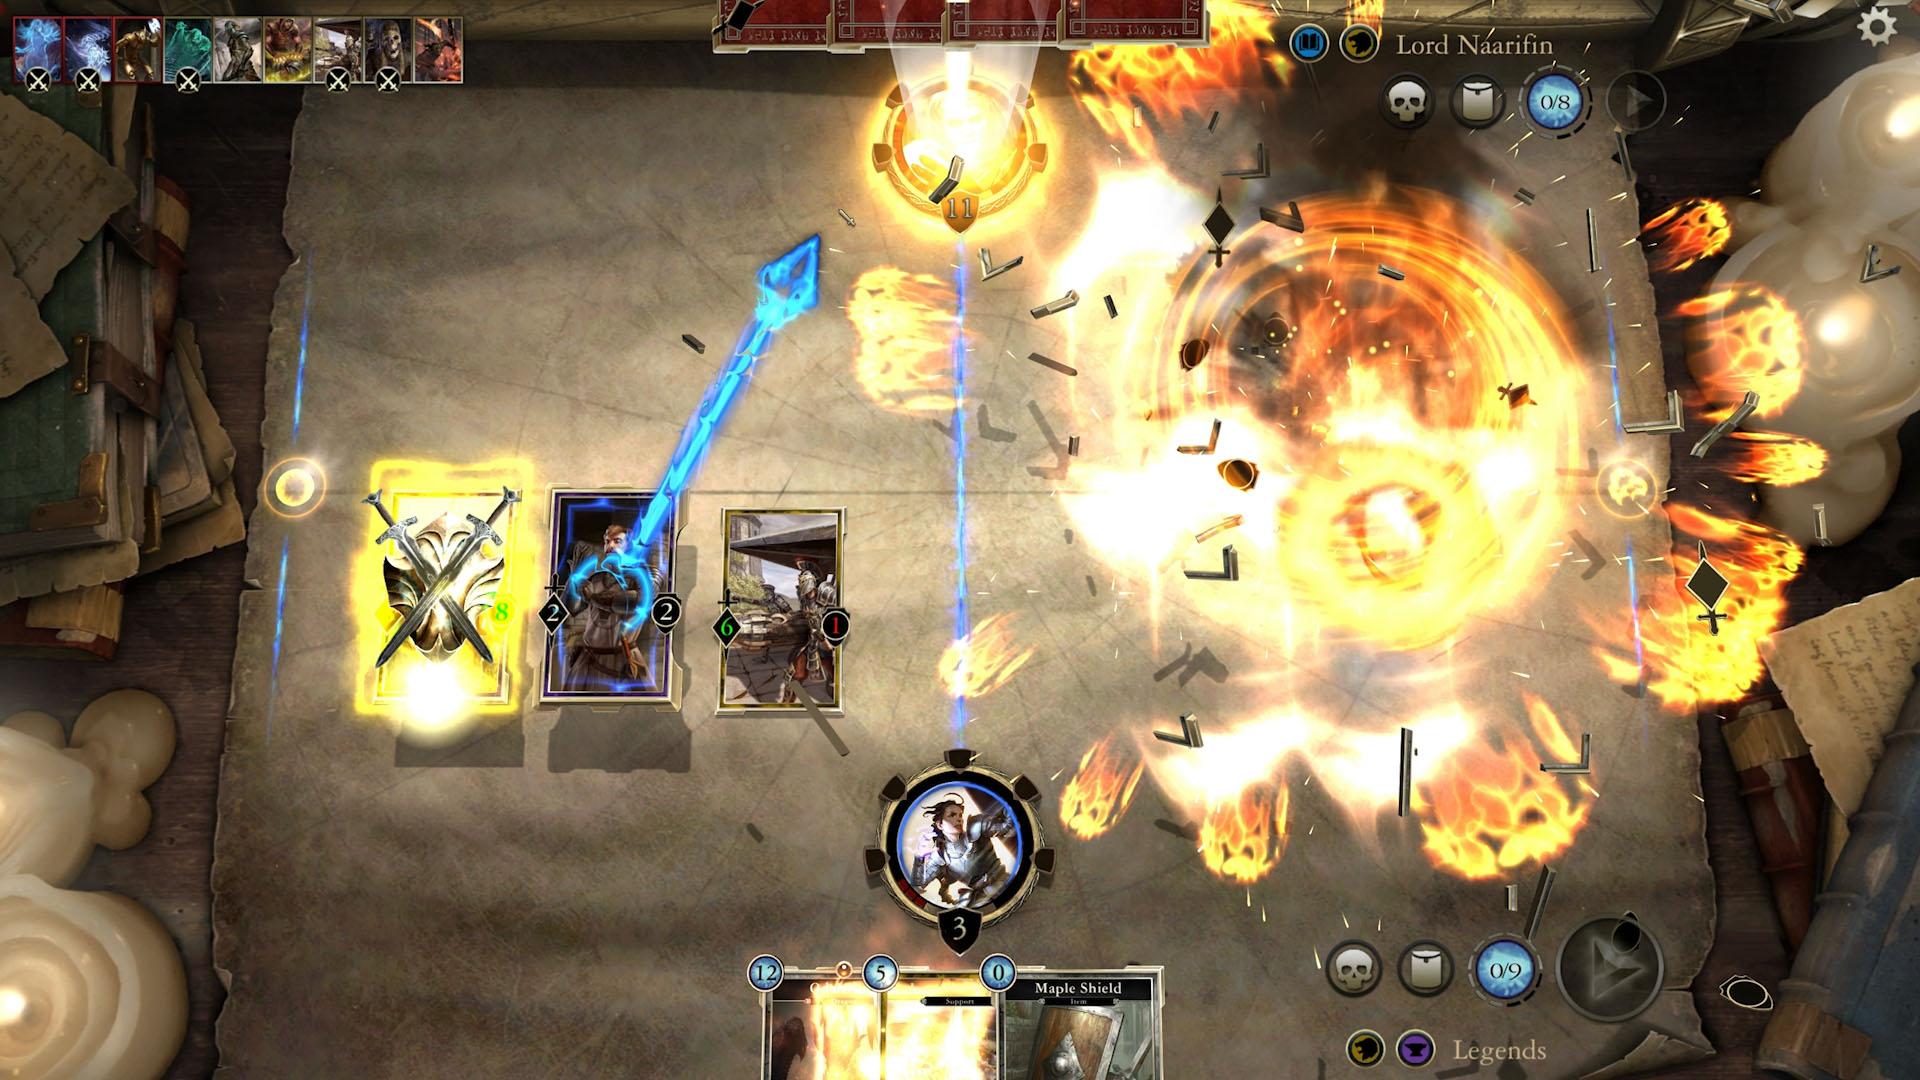 Elder Scrolls: Legends launches PC open beta